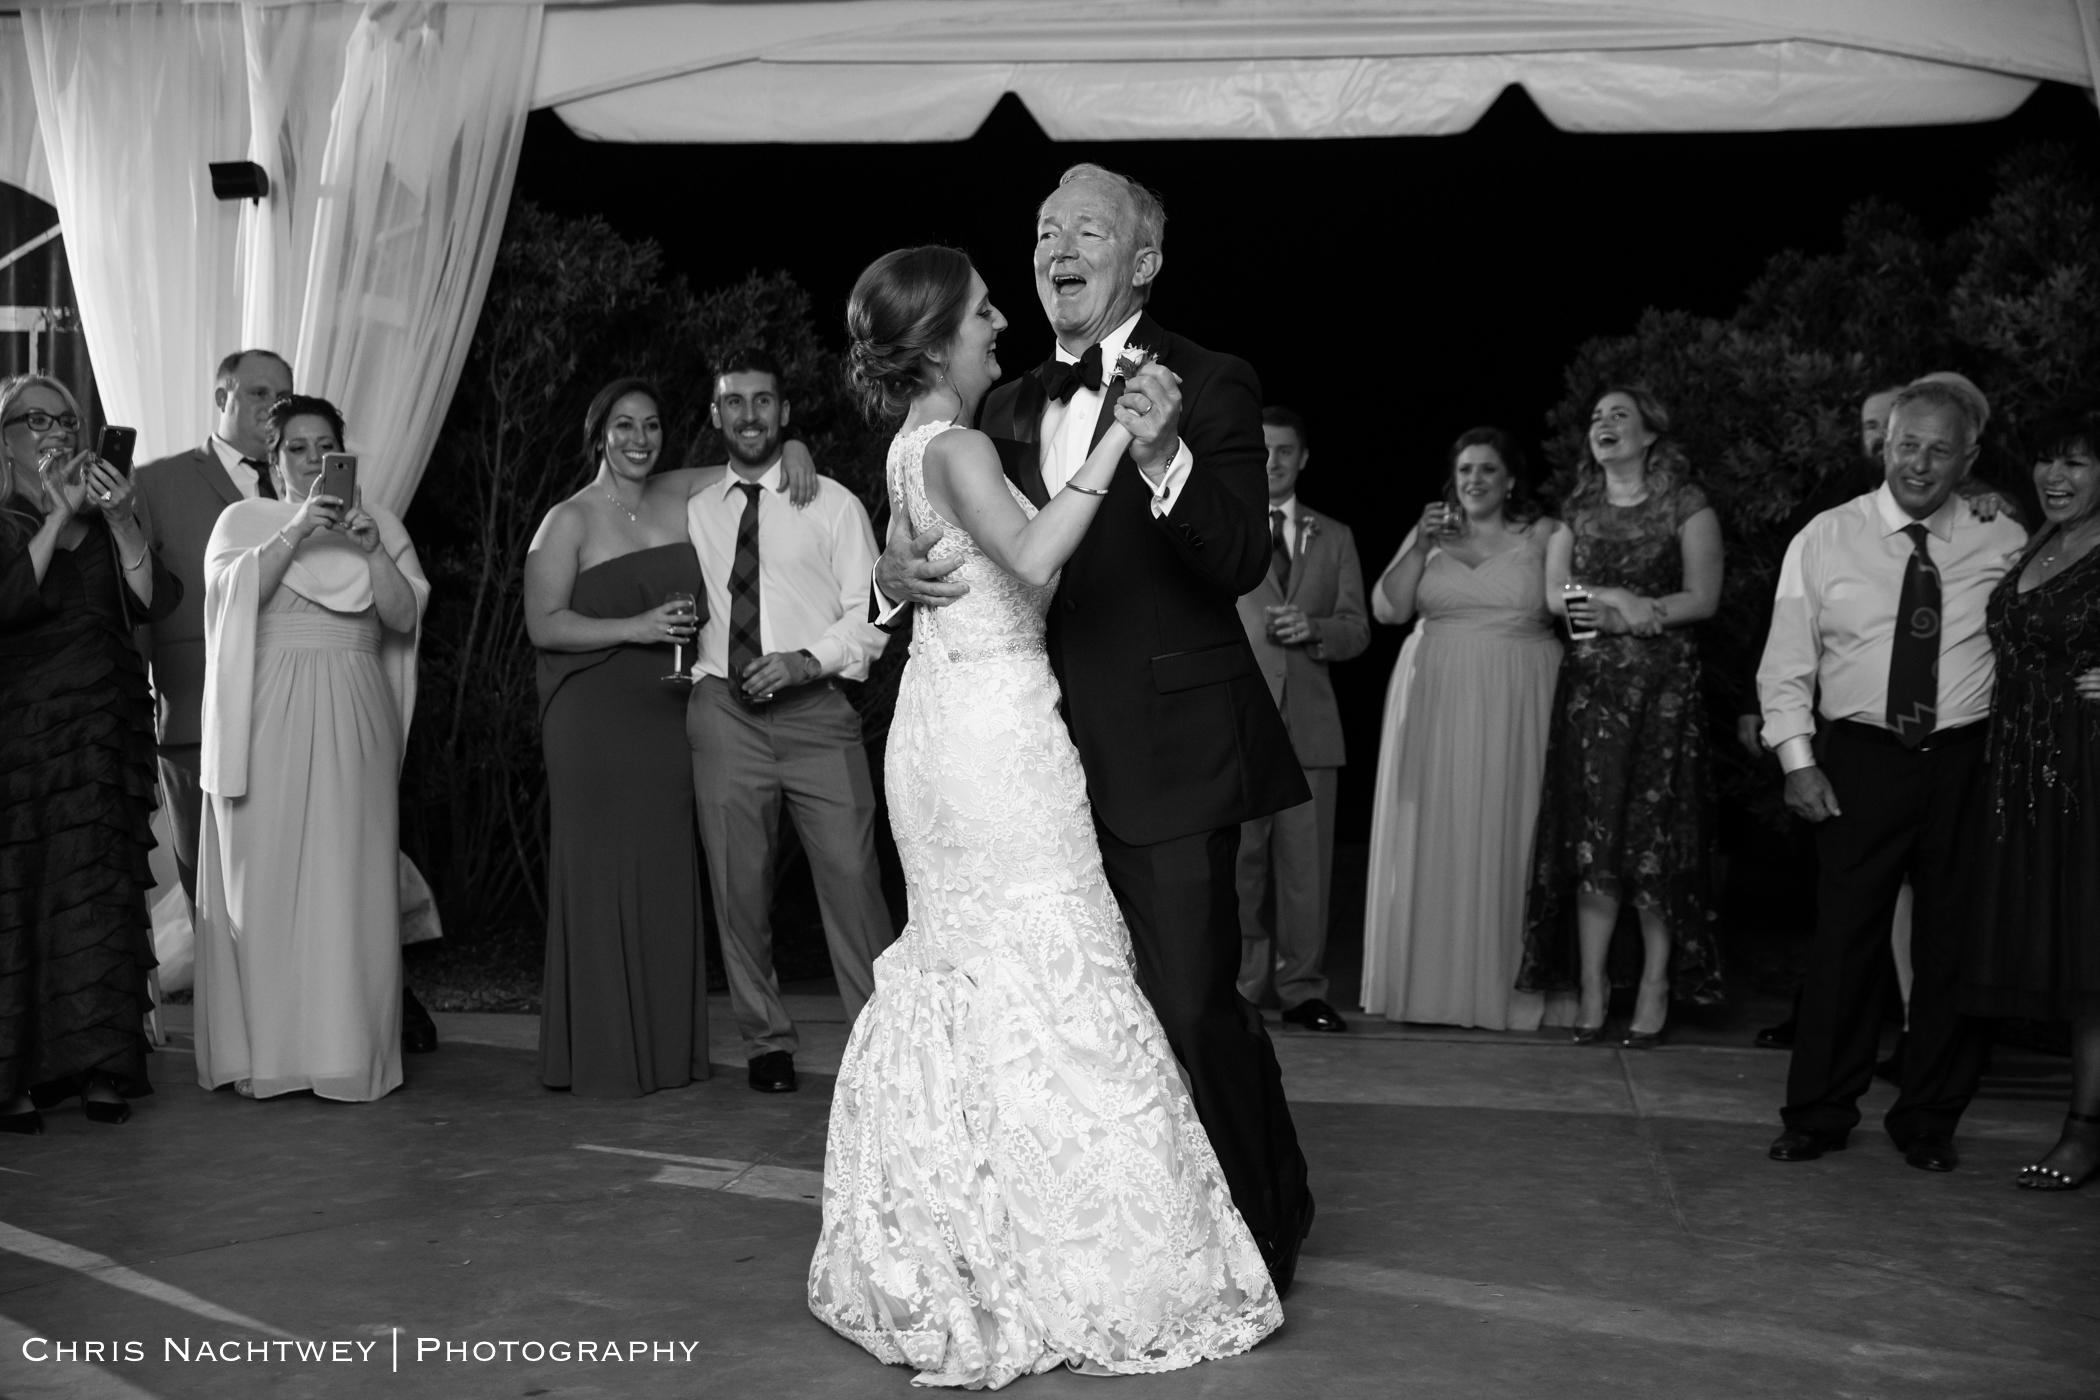 harkness-wedding-photos-chris-nachtwey-photography-2018-38.jpg